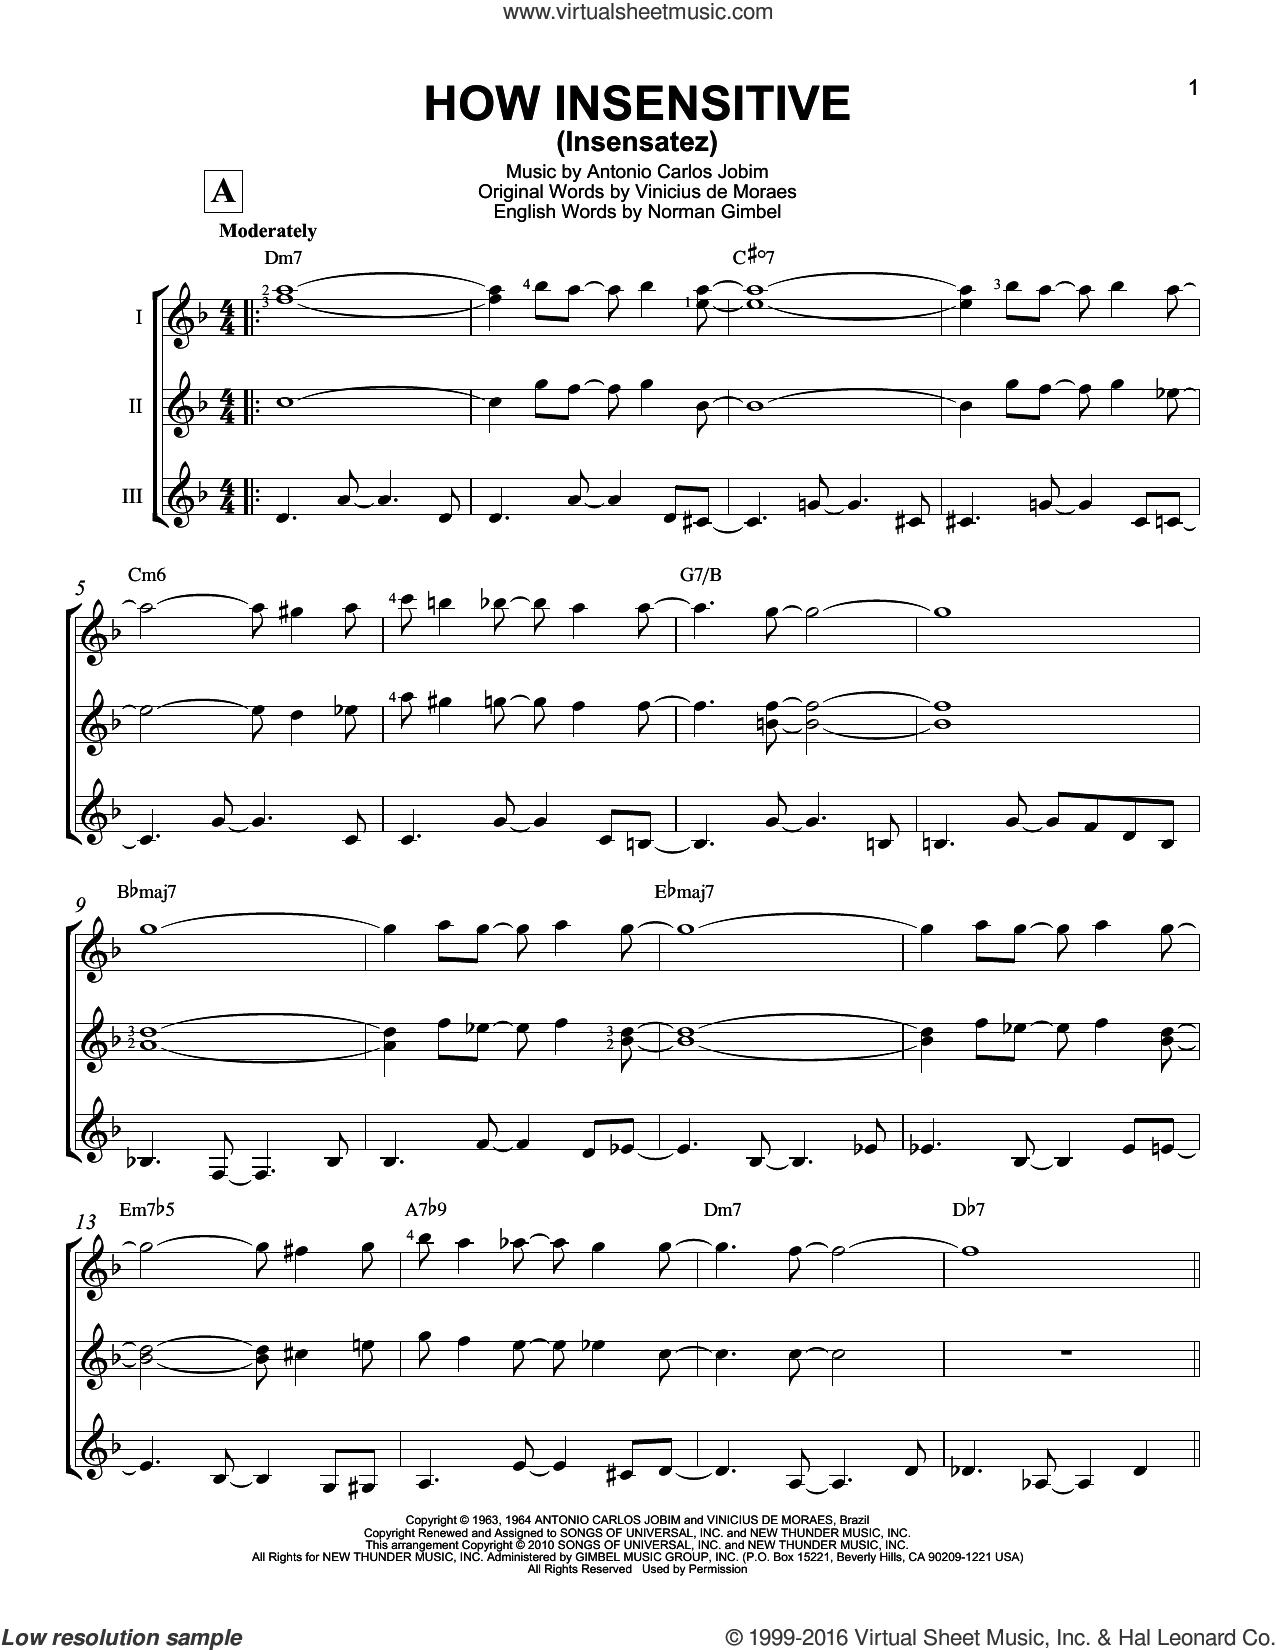 How Insensitive (Insensatez) sheet music for guitar ensemble by Antonio Carlos Jobim, Astrud Gilberto, Norman Gimbel and Vinicius de Moraes, intermediate skill level